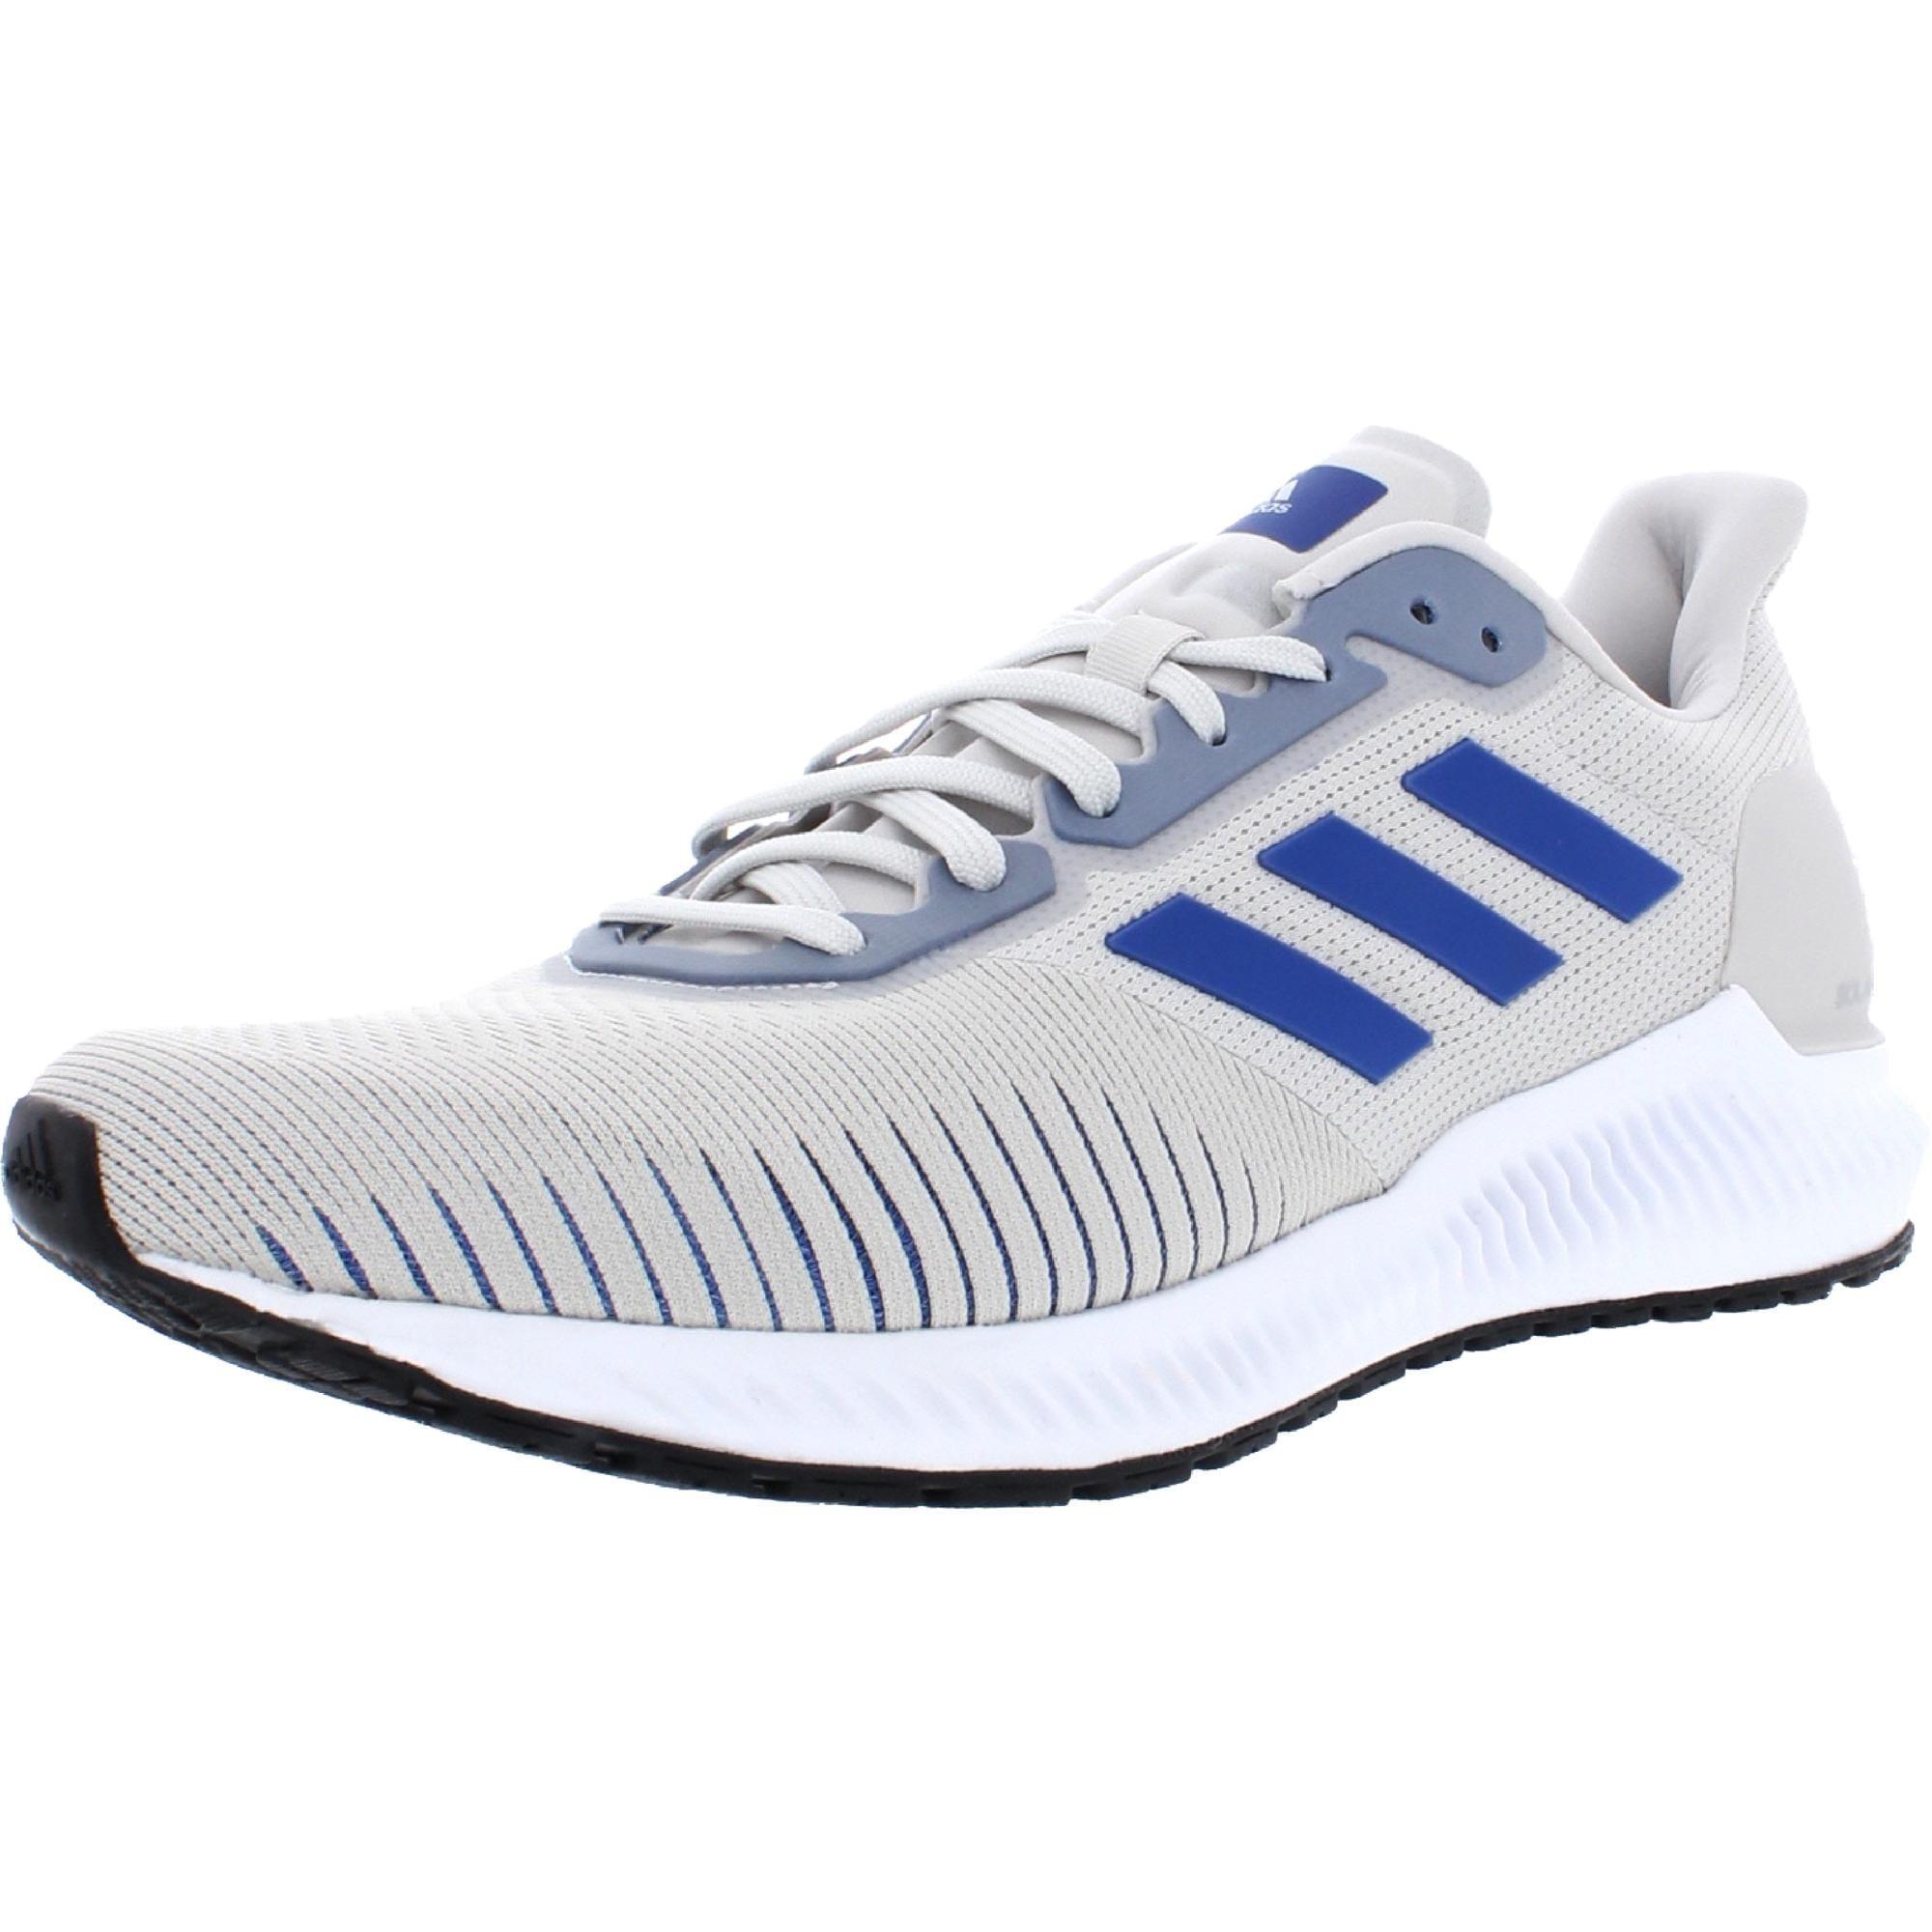 Adidas Mens Solar Ride Running Shoes Mesh Sport - Grey One/Collegiate Royal/Core Black